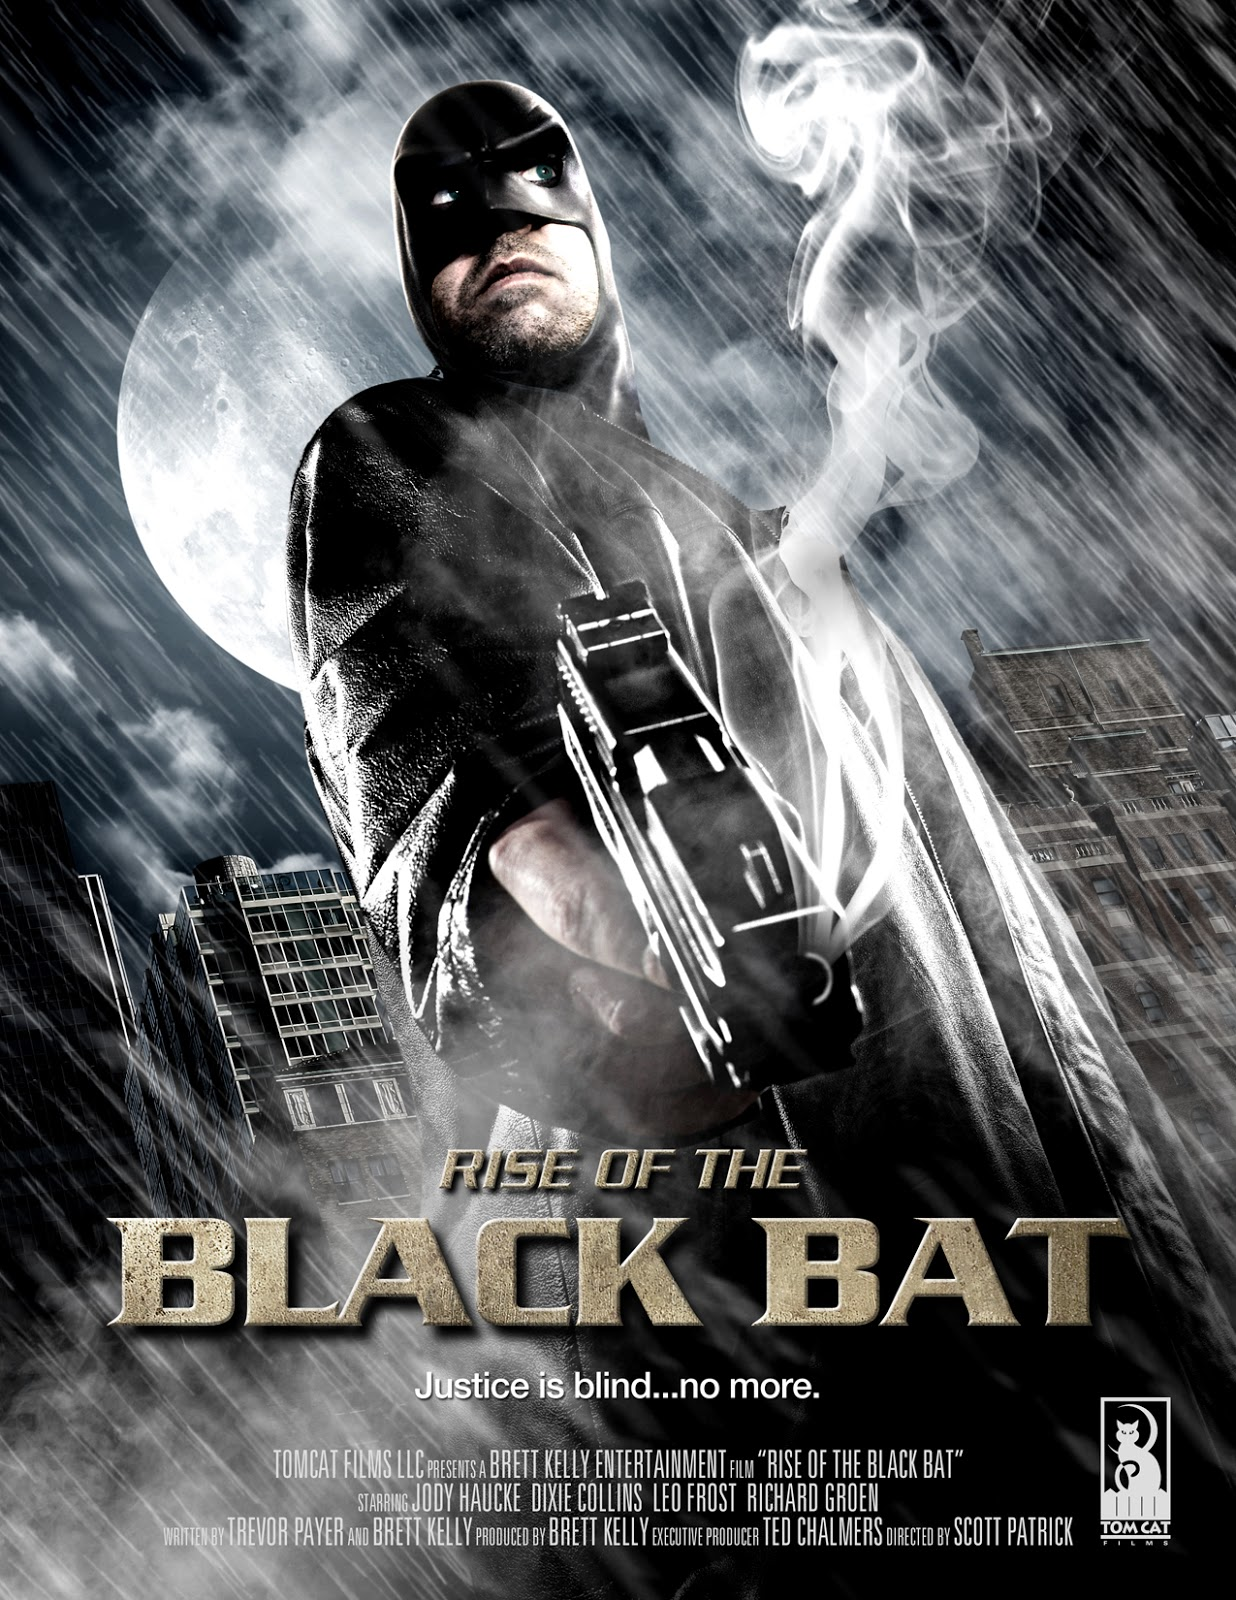 Rise of the Black Bat (2013)